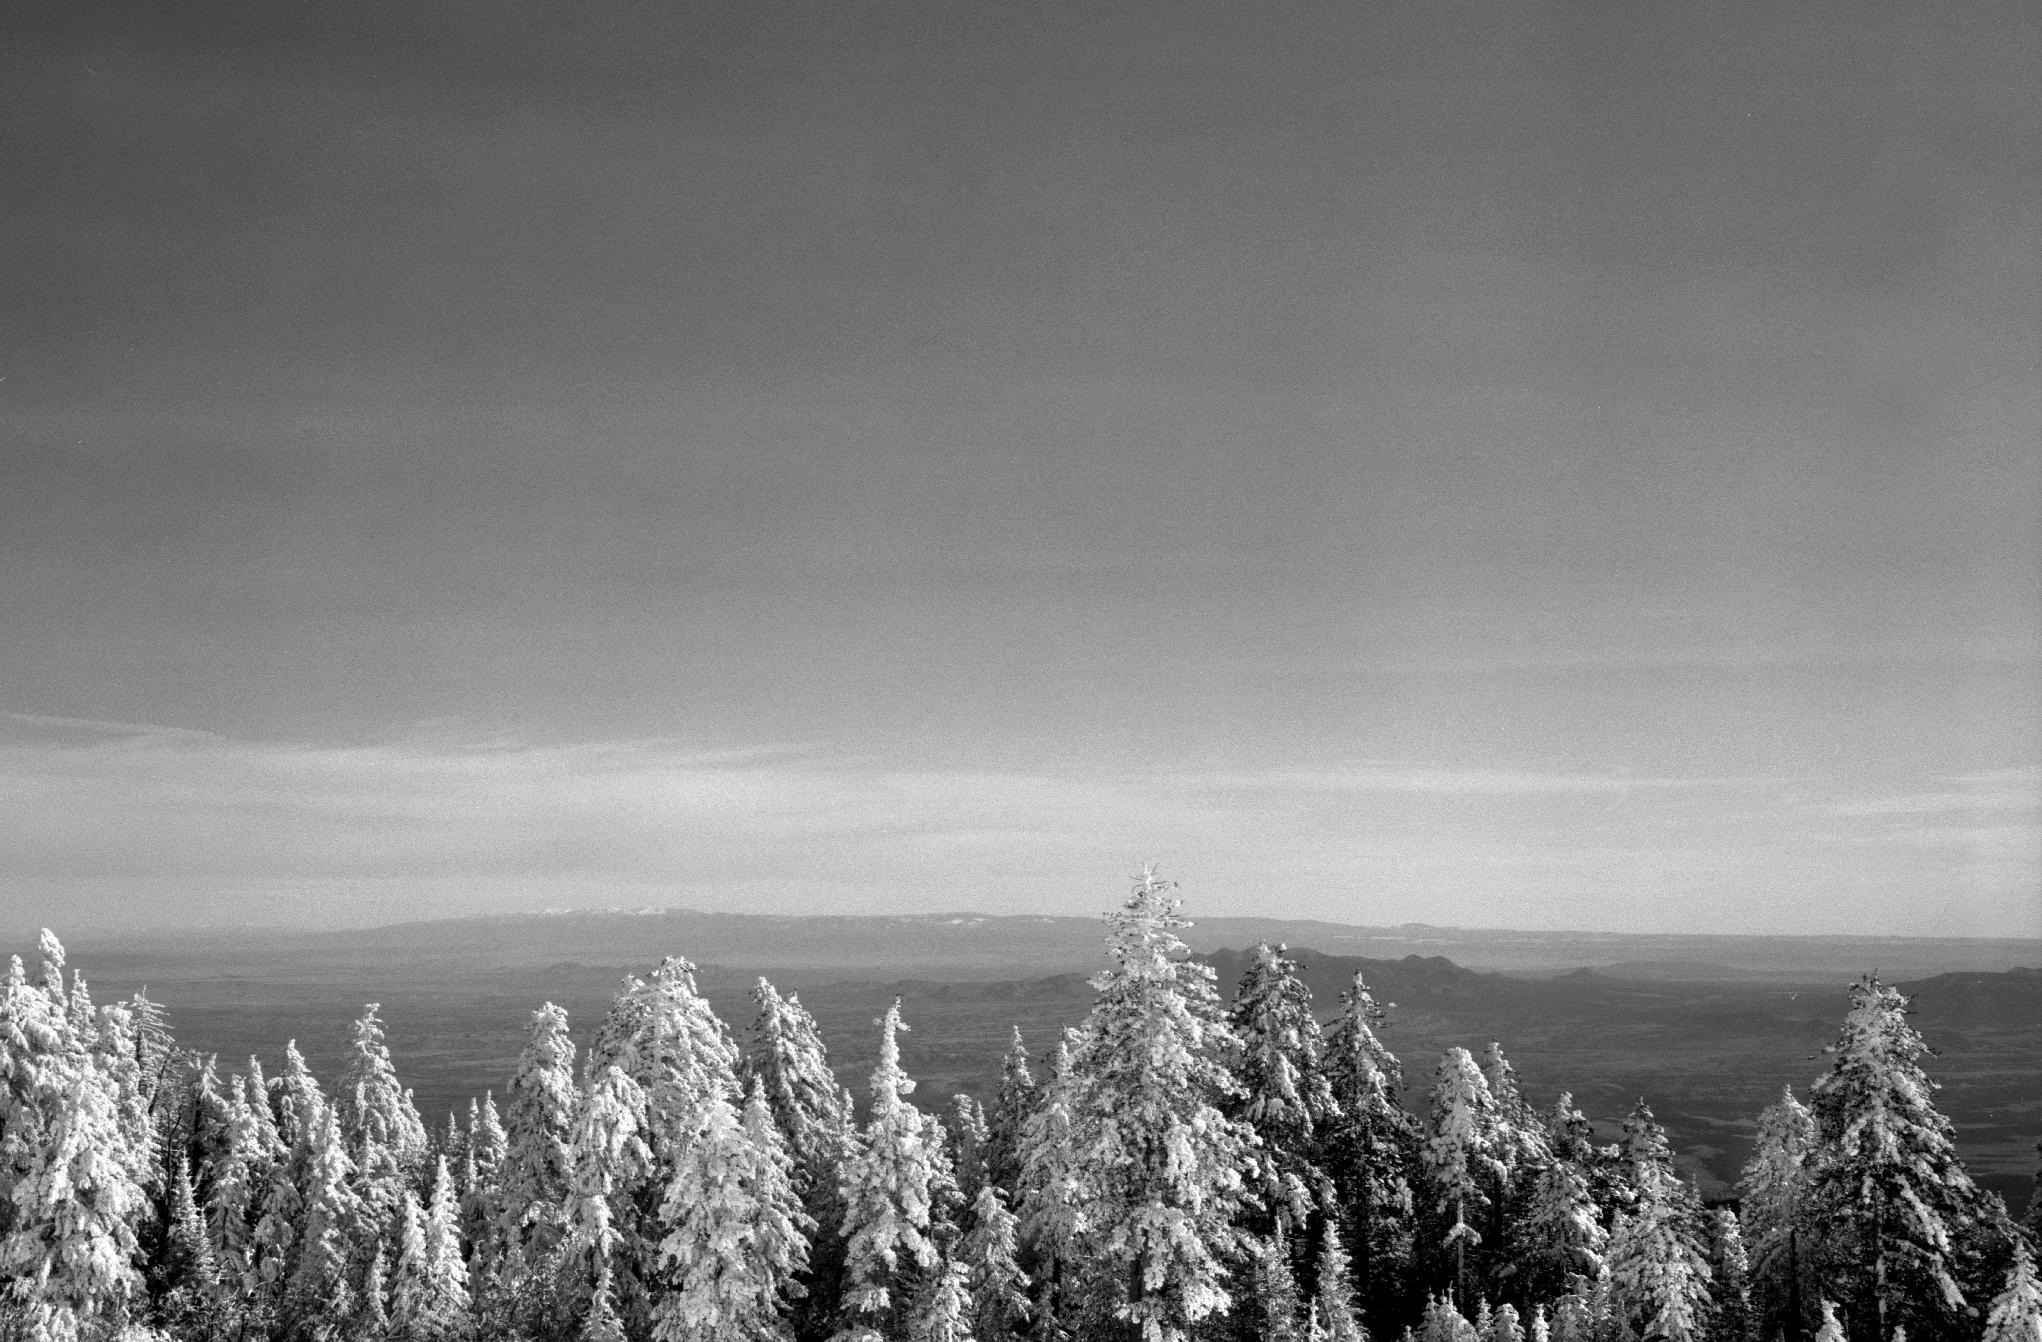 Photography by John Sykes Jr. (381)